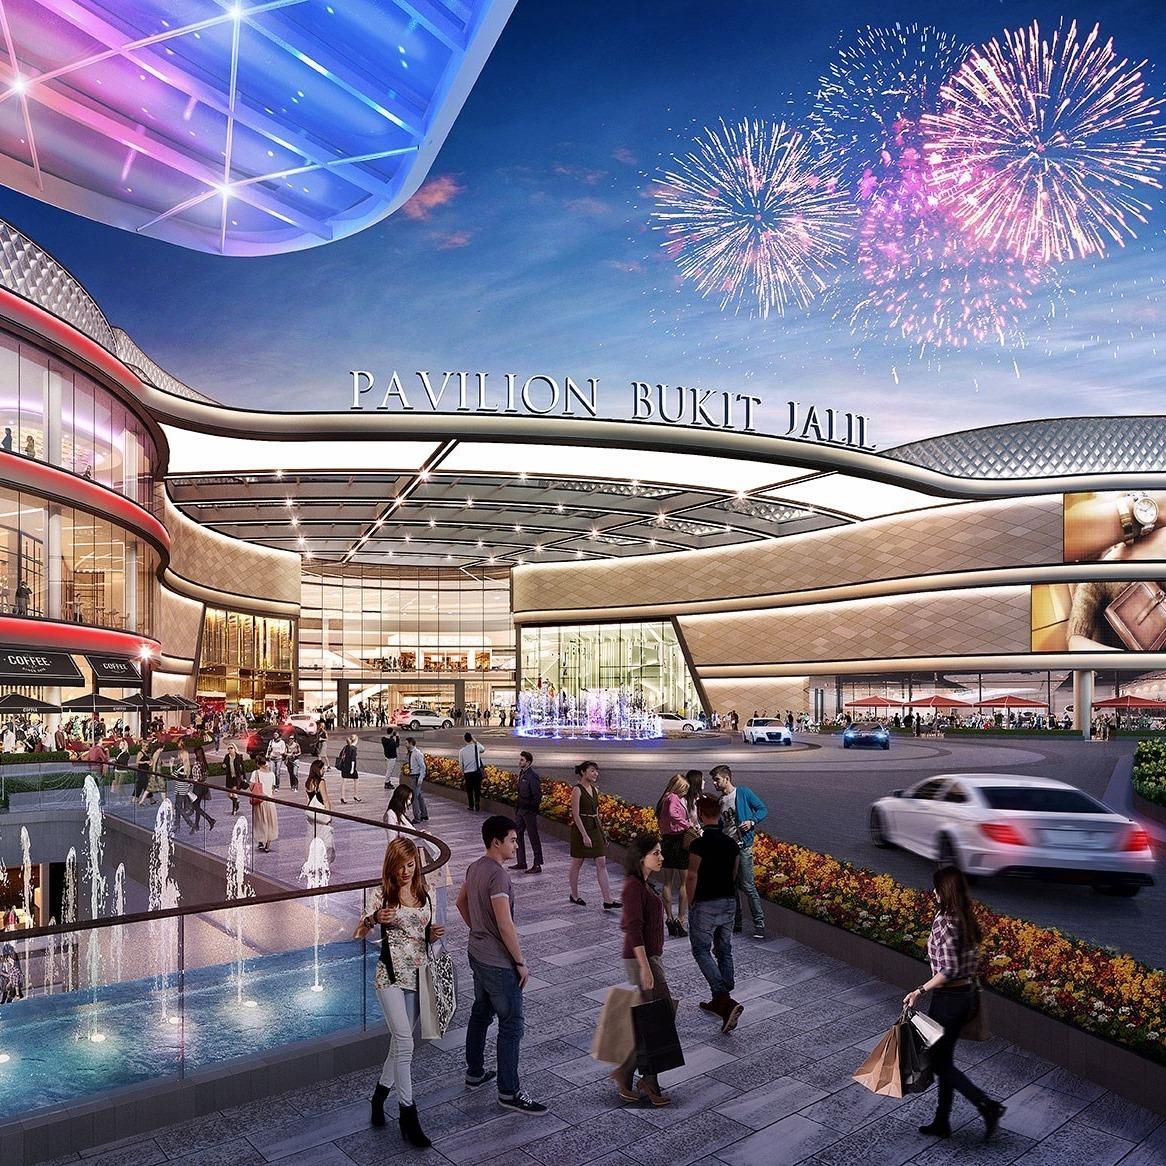 XplodeLIAO_ShoppingMall_购物广场_Pavilion_BukitJalil